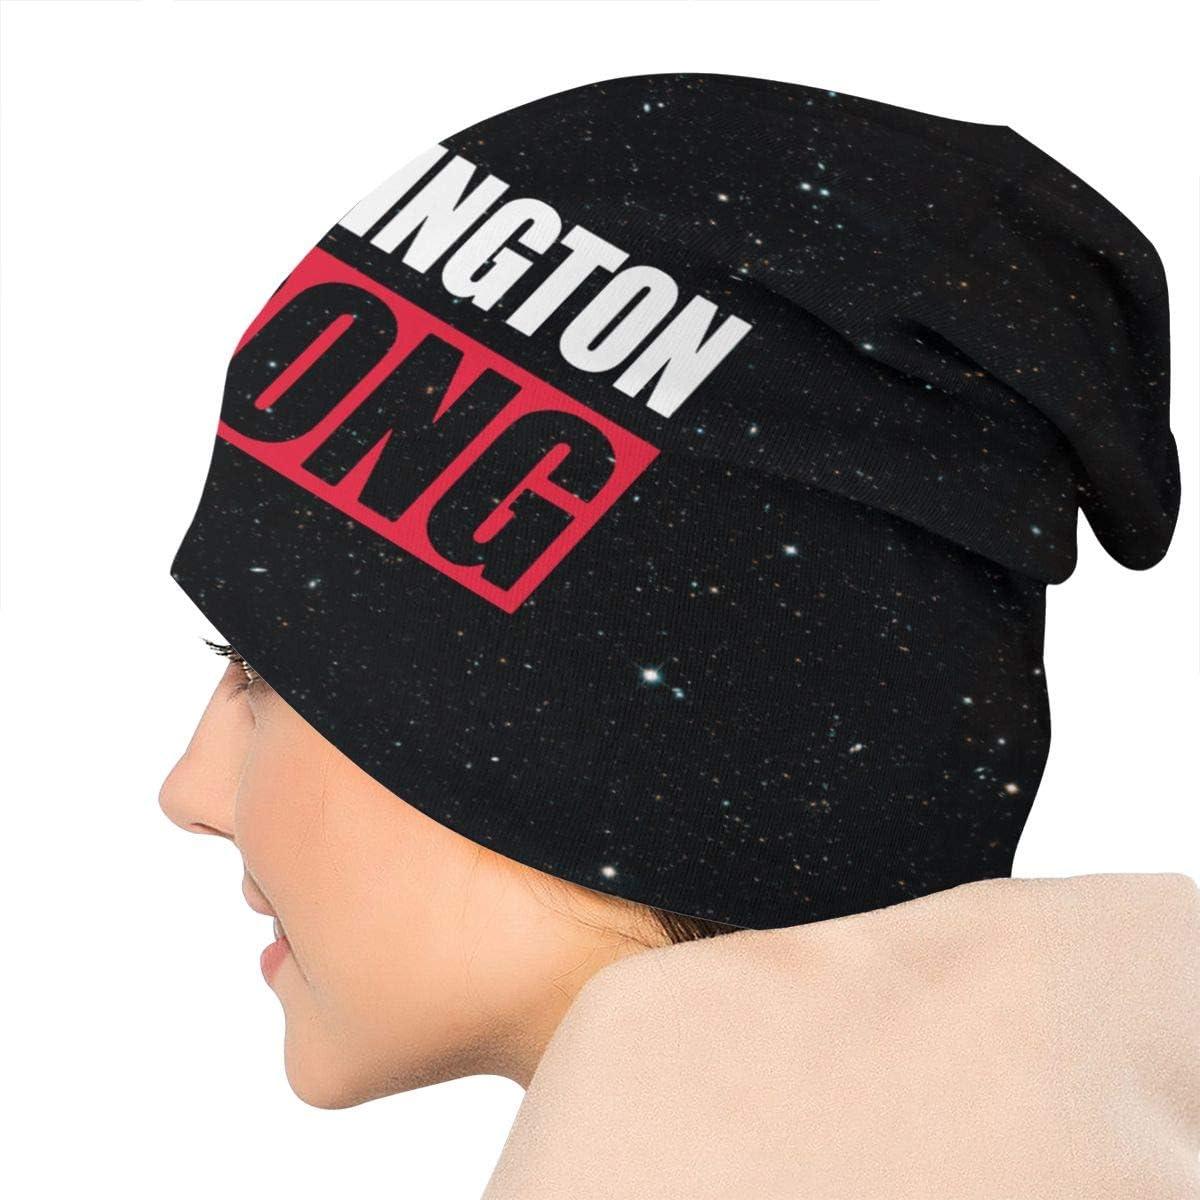 JINGUImao Washington Strong Unisex Warm Hat Knit Hat Skull Cap Beanies Cap